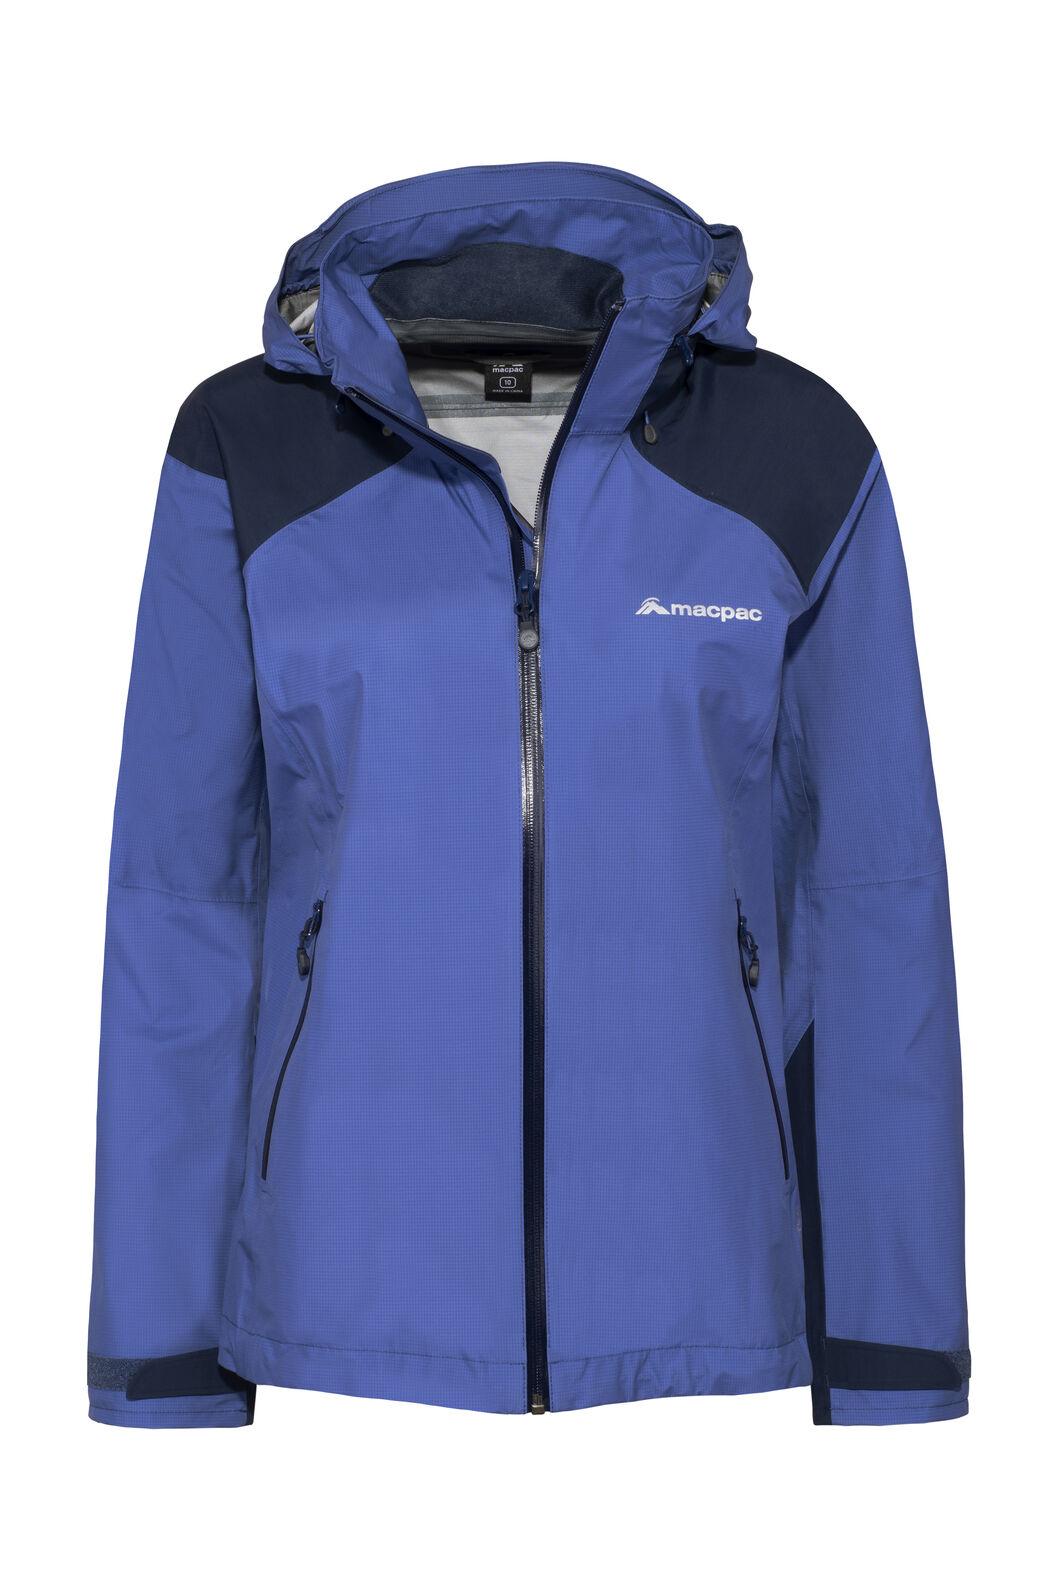 Macpac Traverse Pertex® Rain Jacket — Women's, Marlin/Black Iris, hi-res